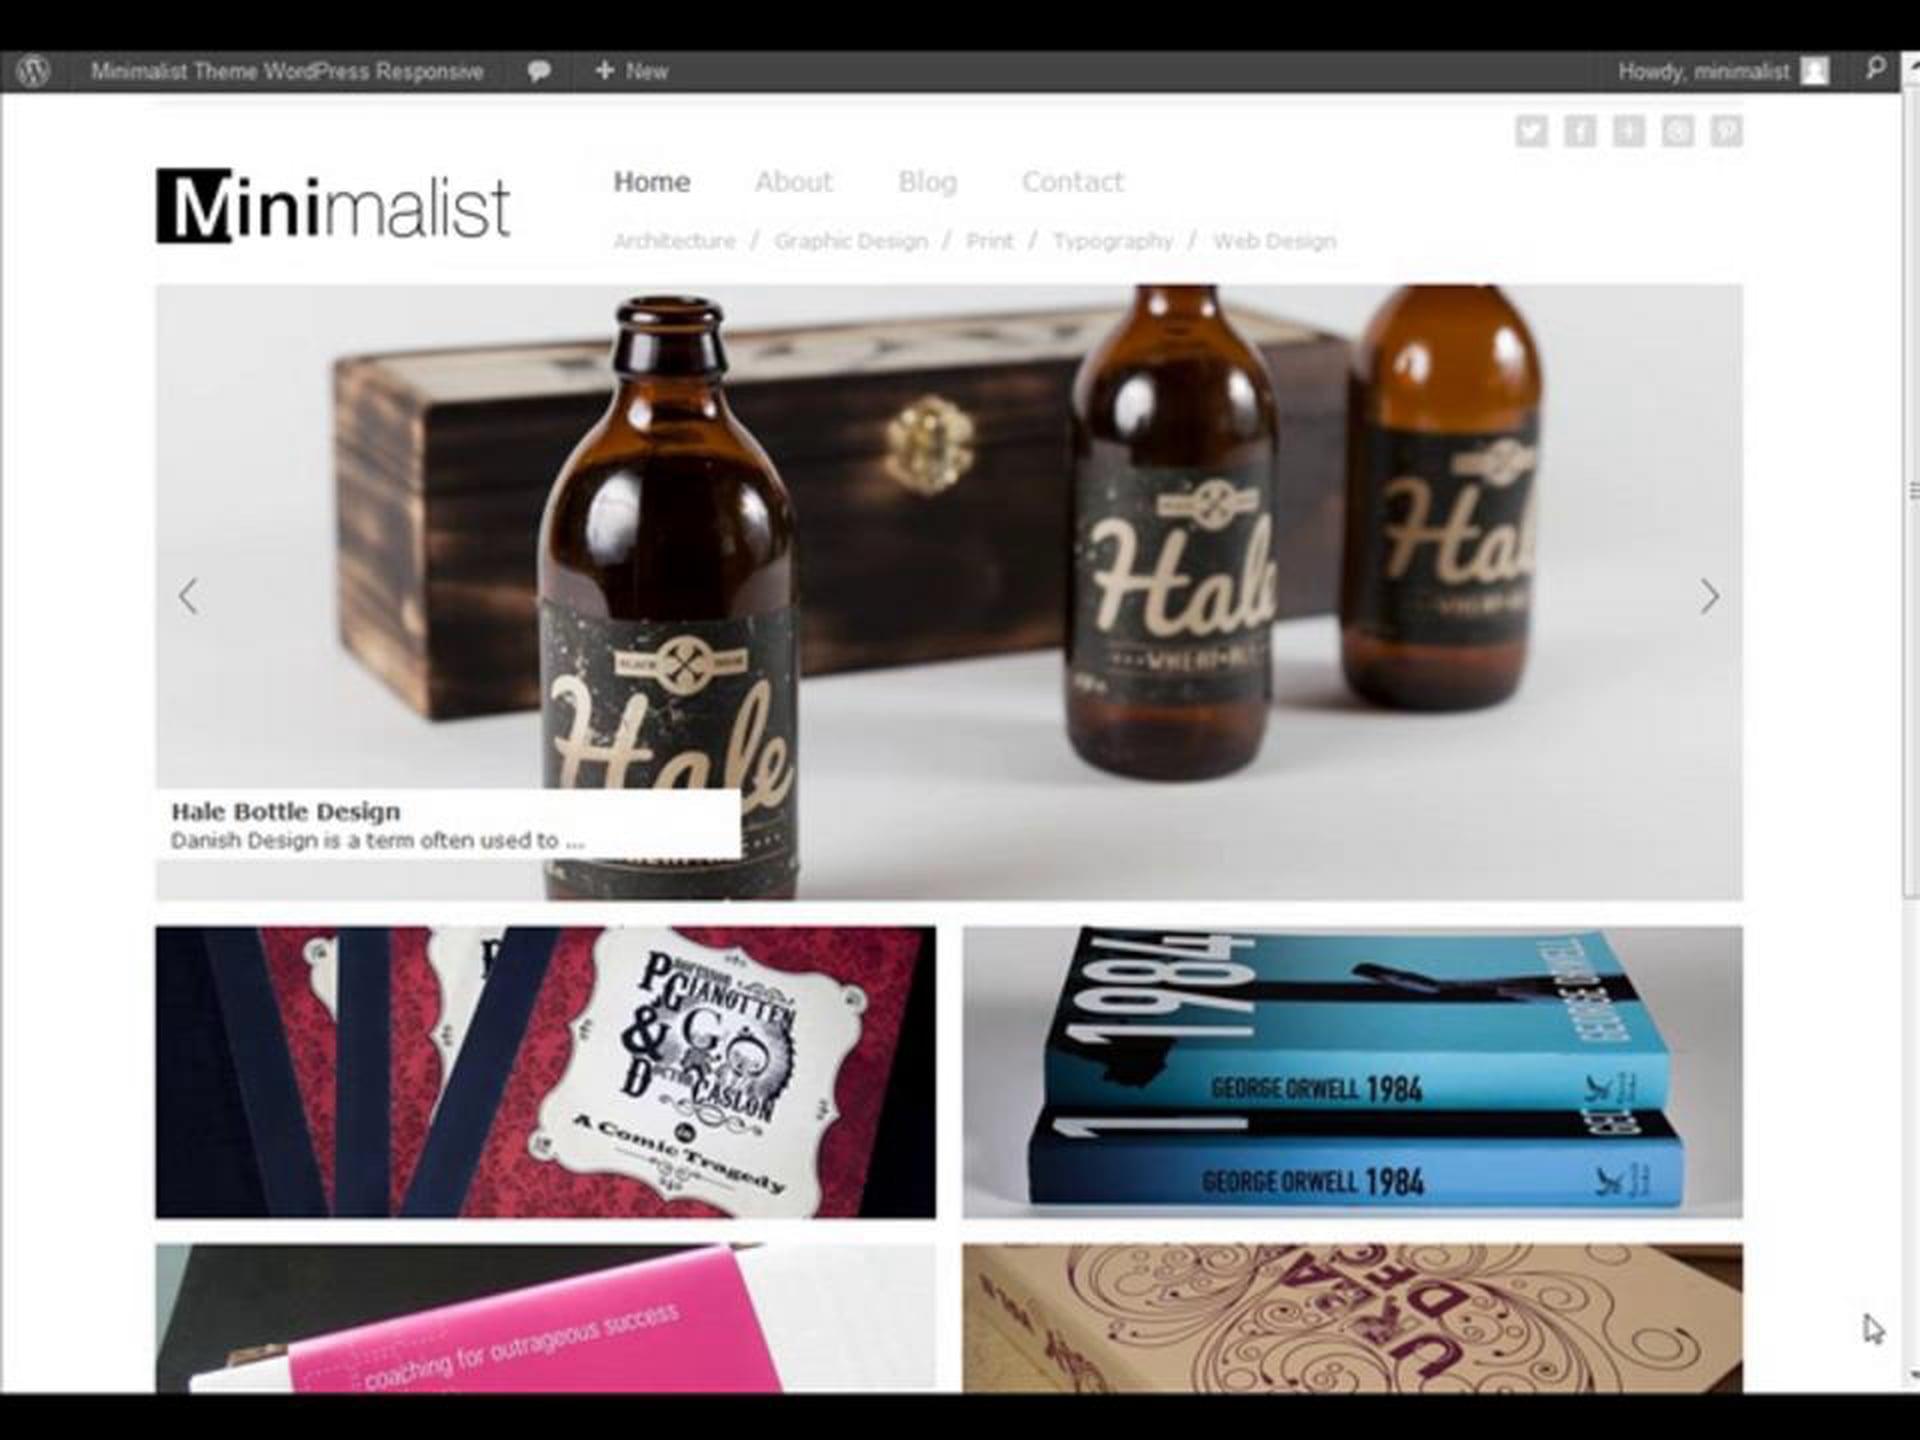 Minimalist WordPress Theme Overview